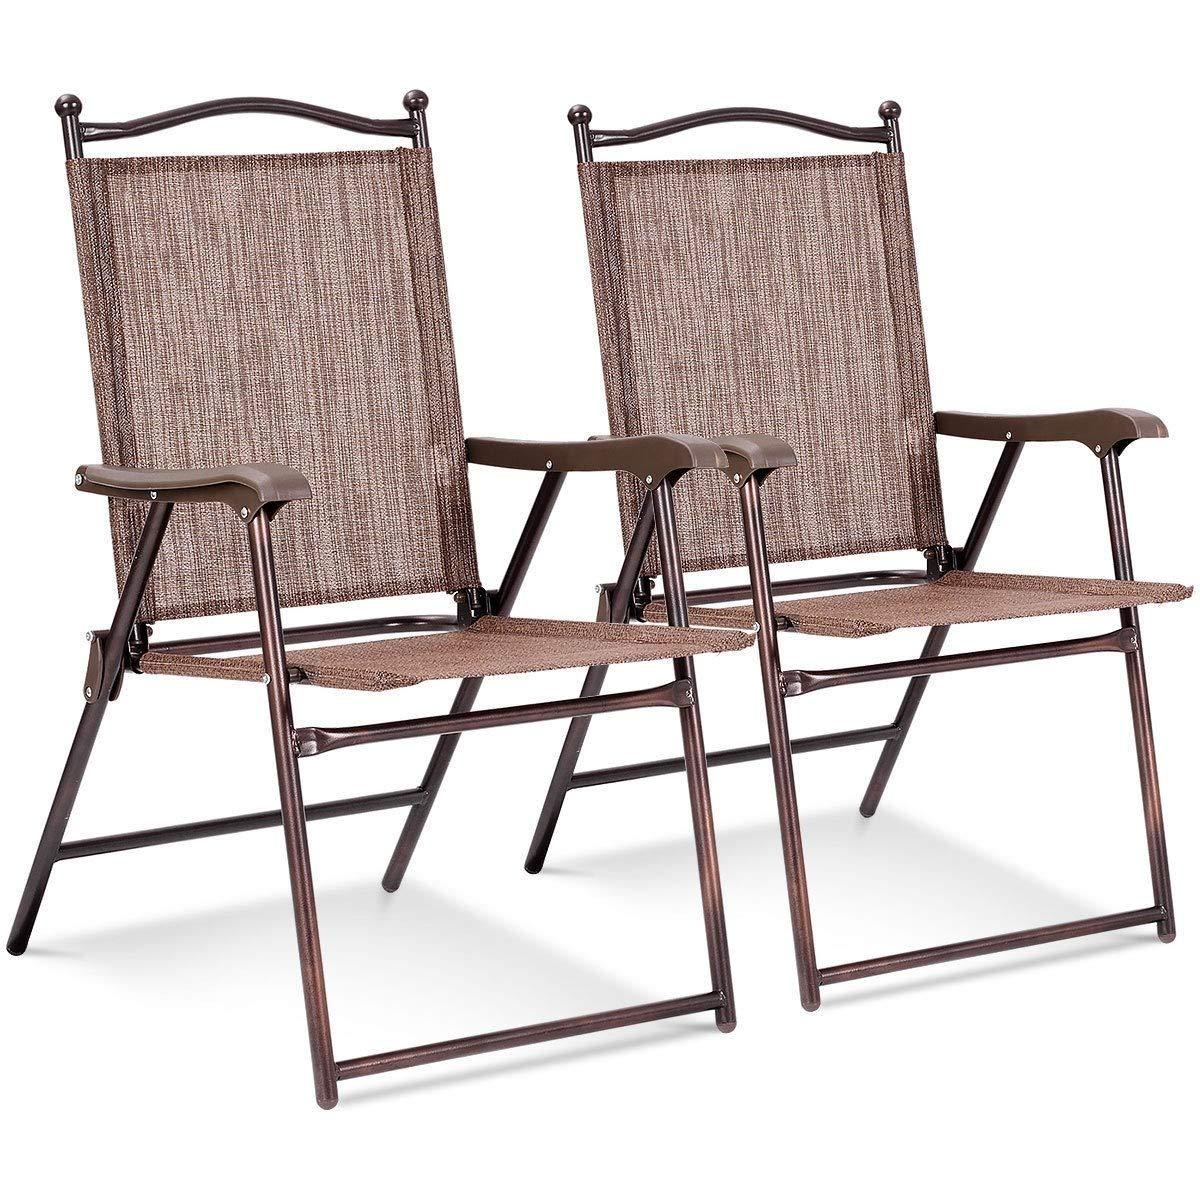 LHONE Folding Sling Back Chairs Furniture Camping Deck Garden Pool Beach (Set of 2) (Coffee)